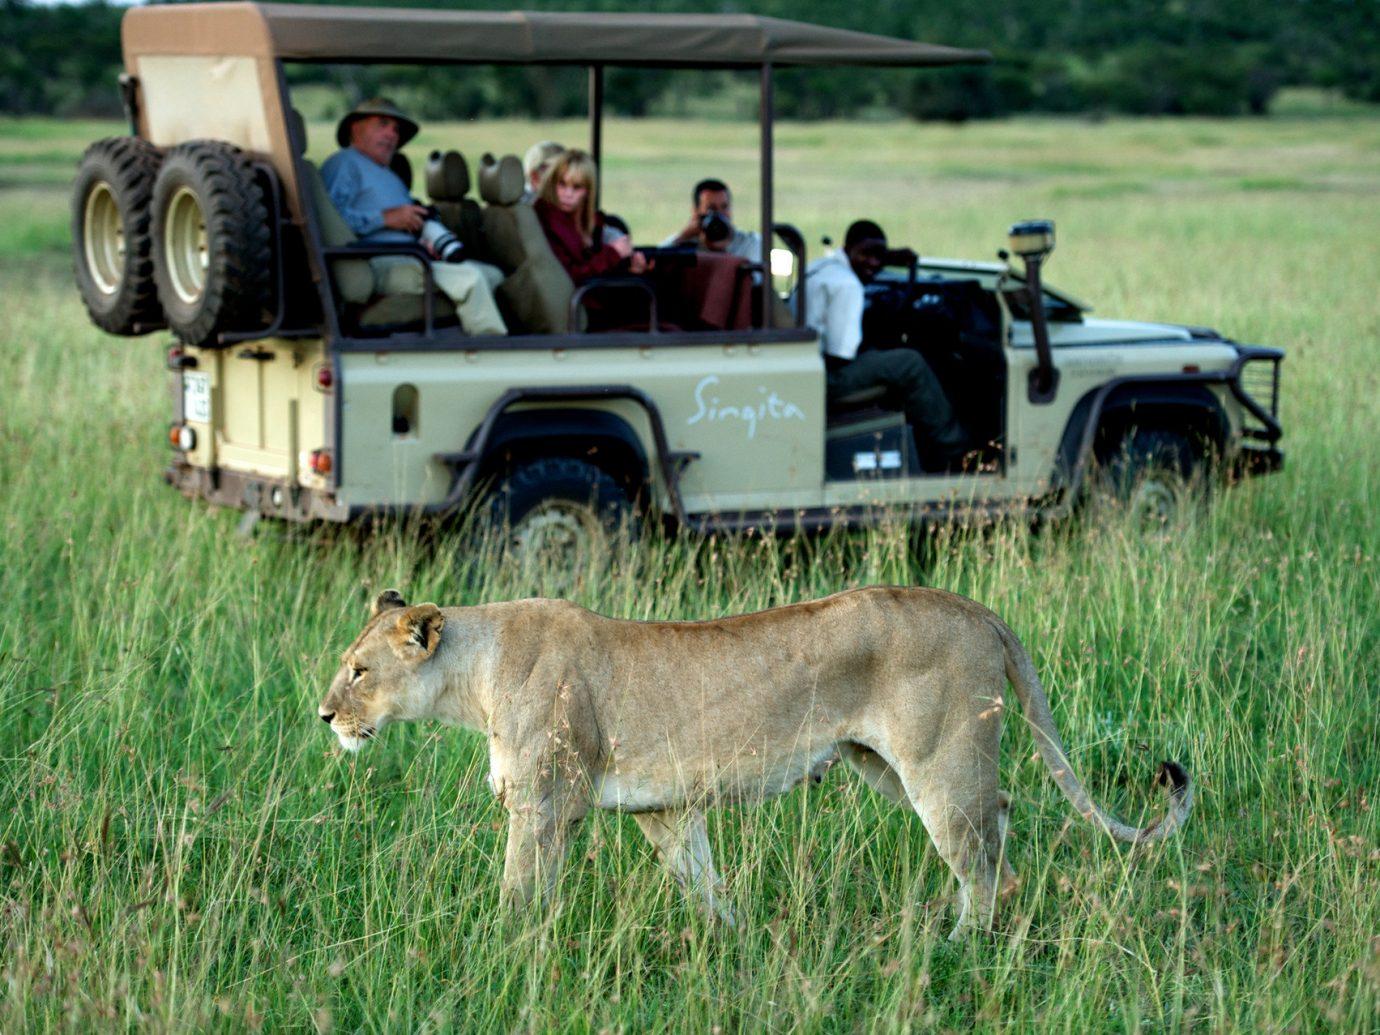 Outdoors + Adventure Travel Tips grass outdoor field mammal animal standing grassland Wildlife prairie Safari Adventure herd Farm